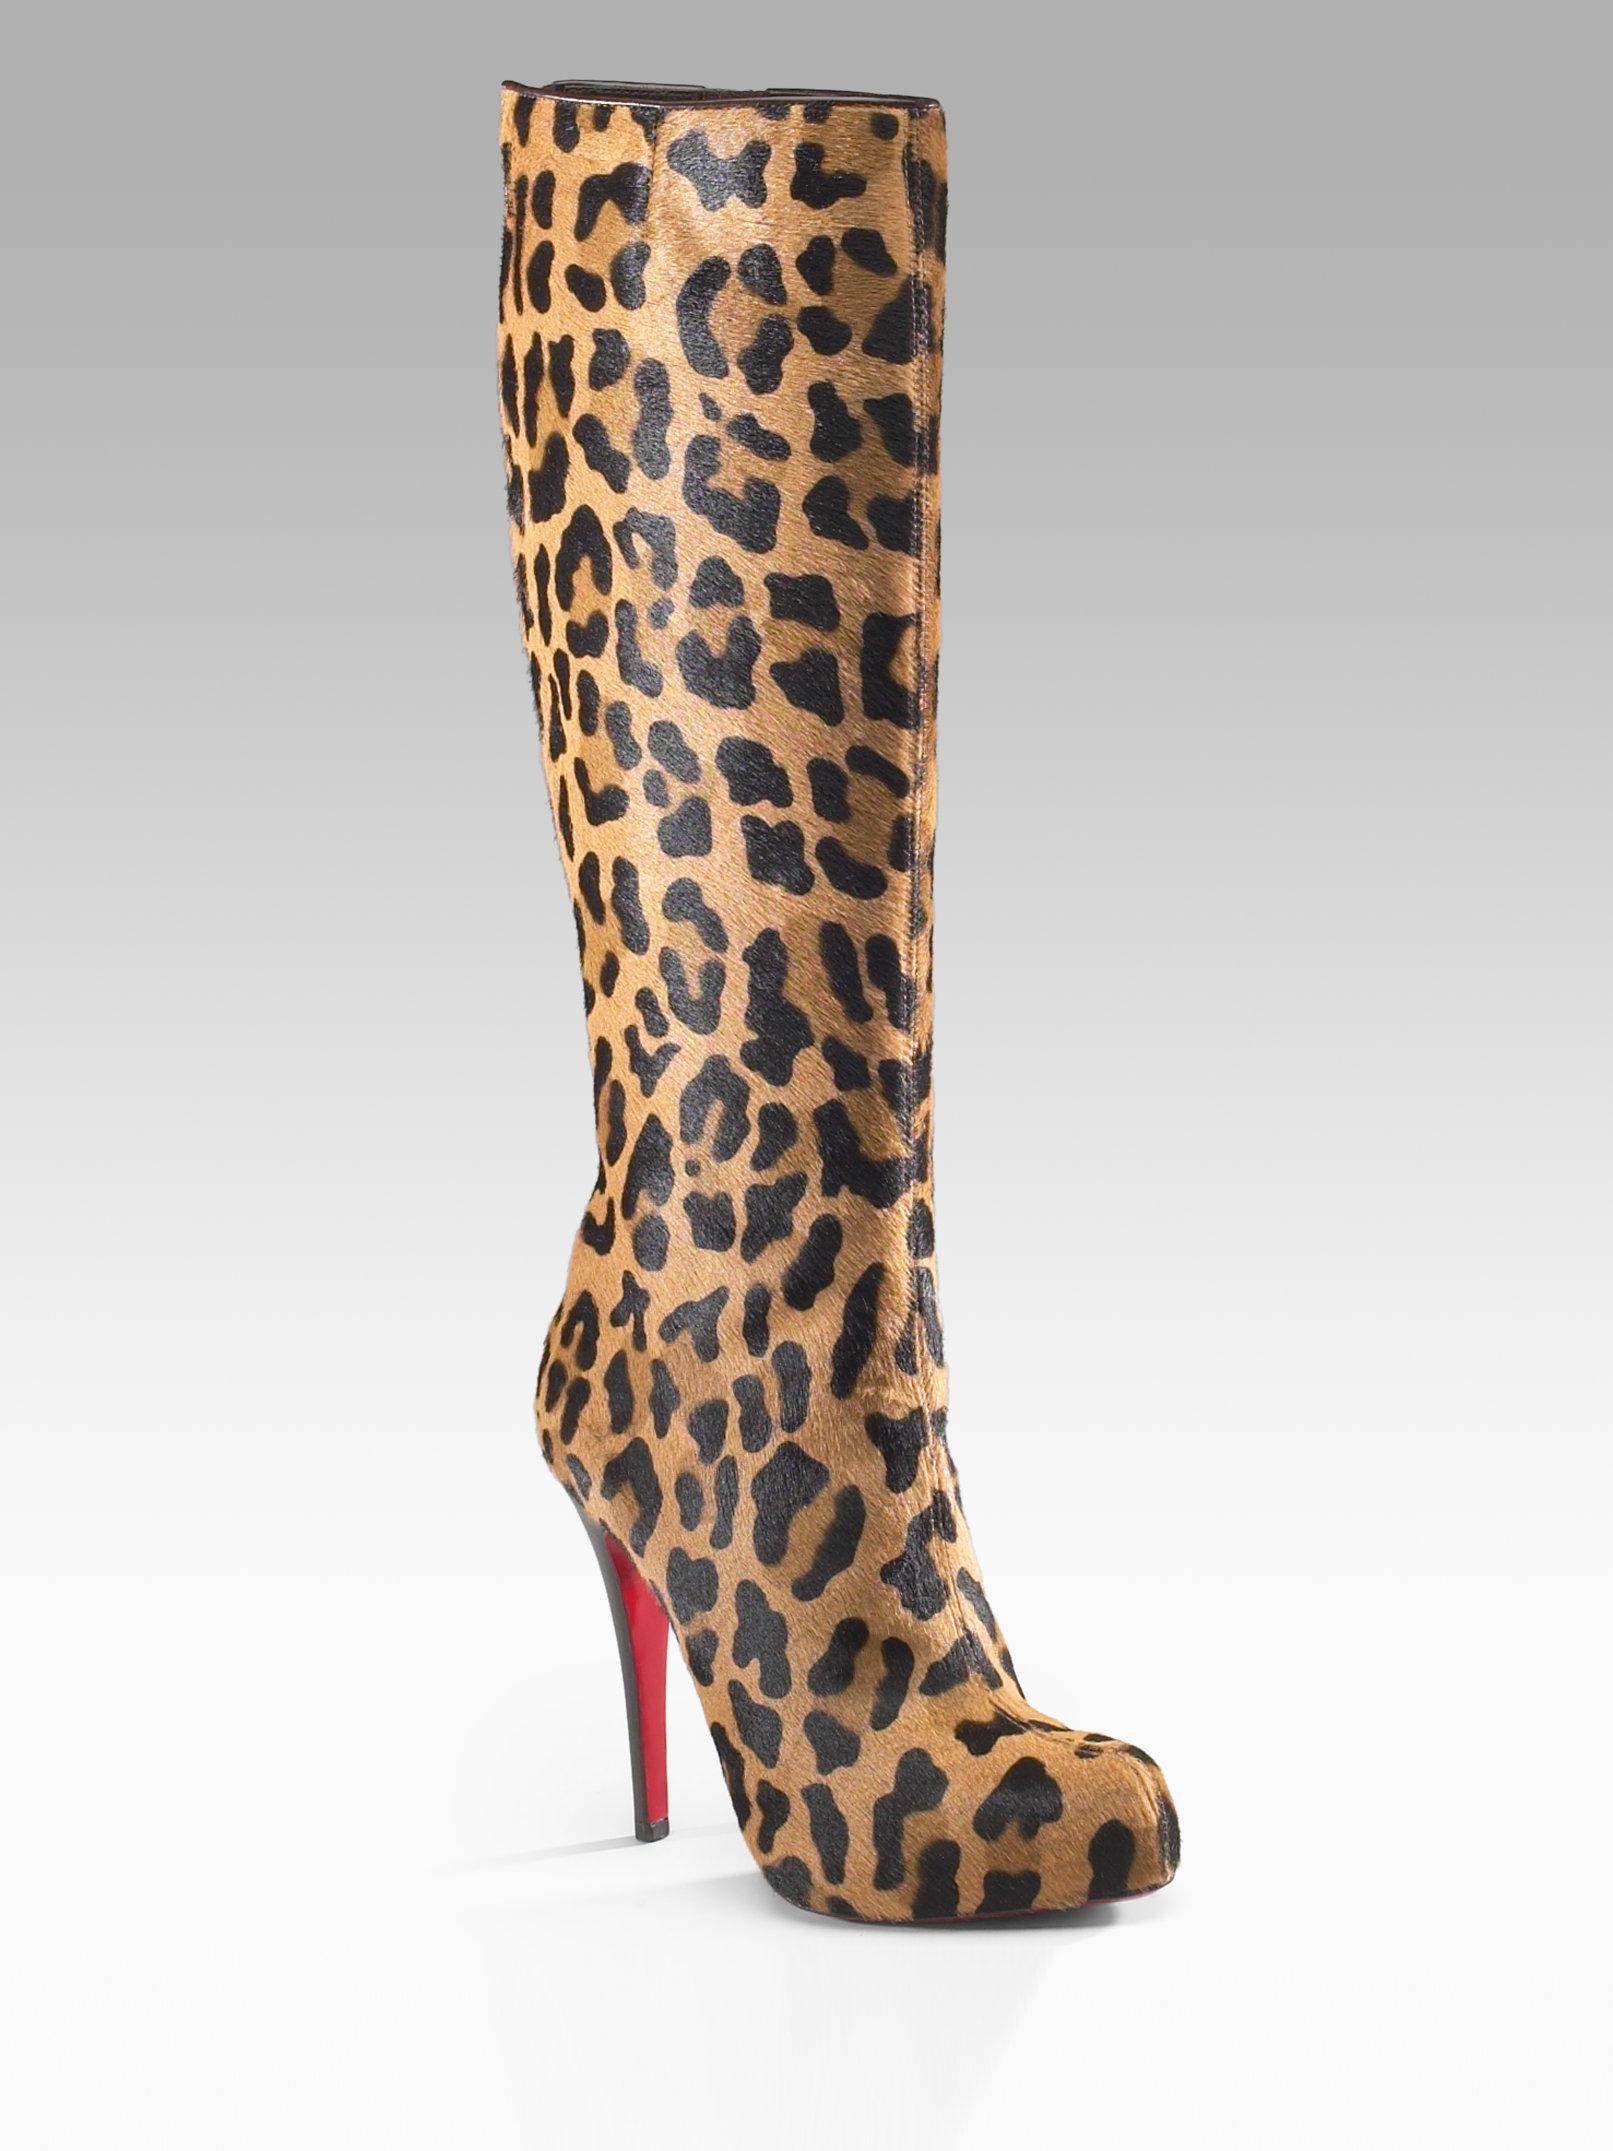 christian louboutin leopard booties